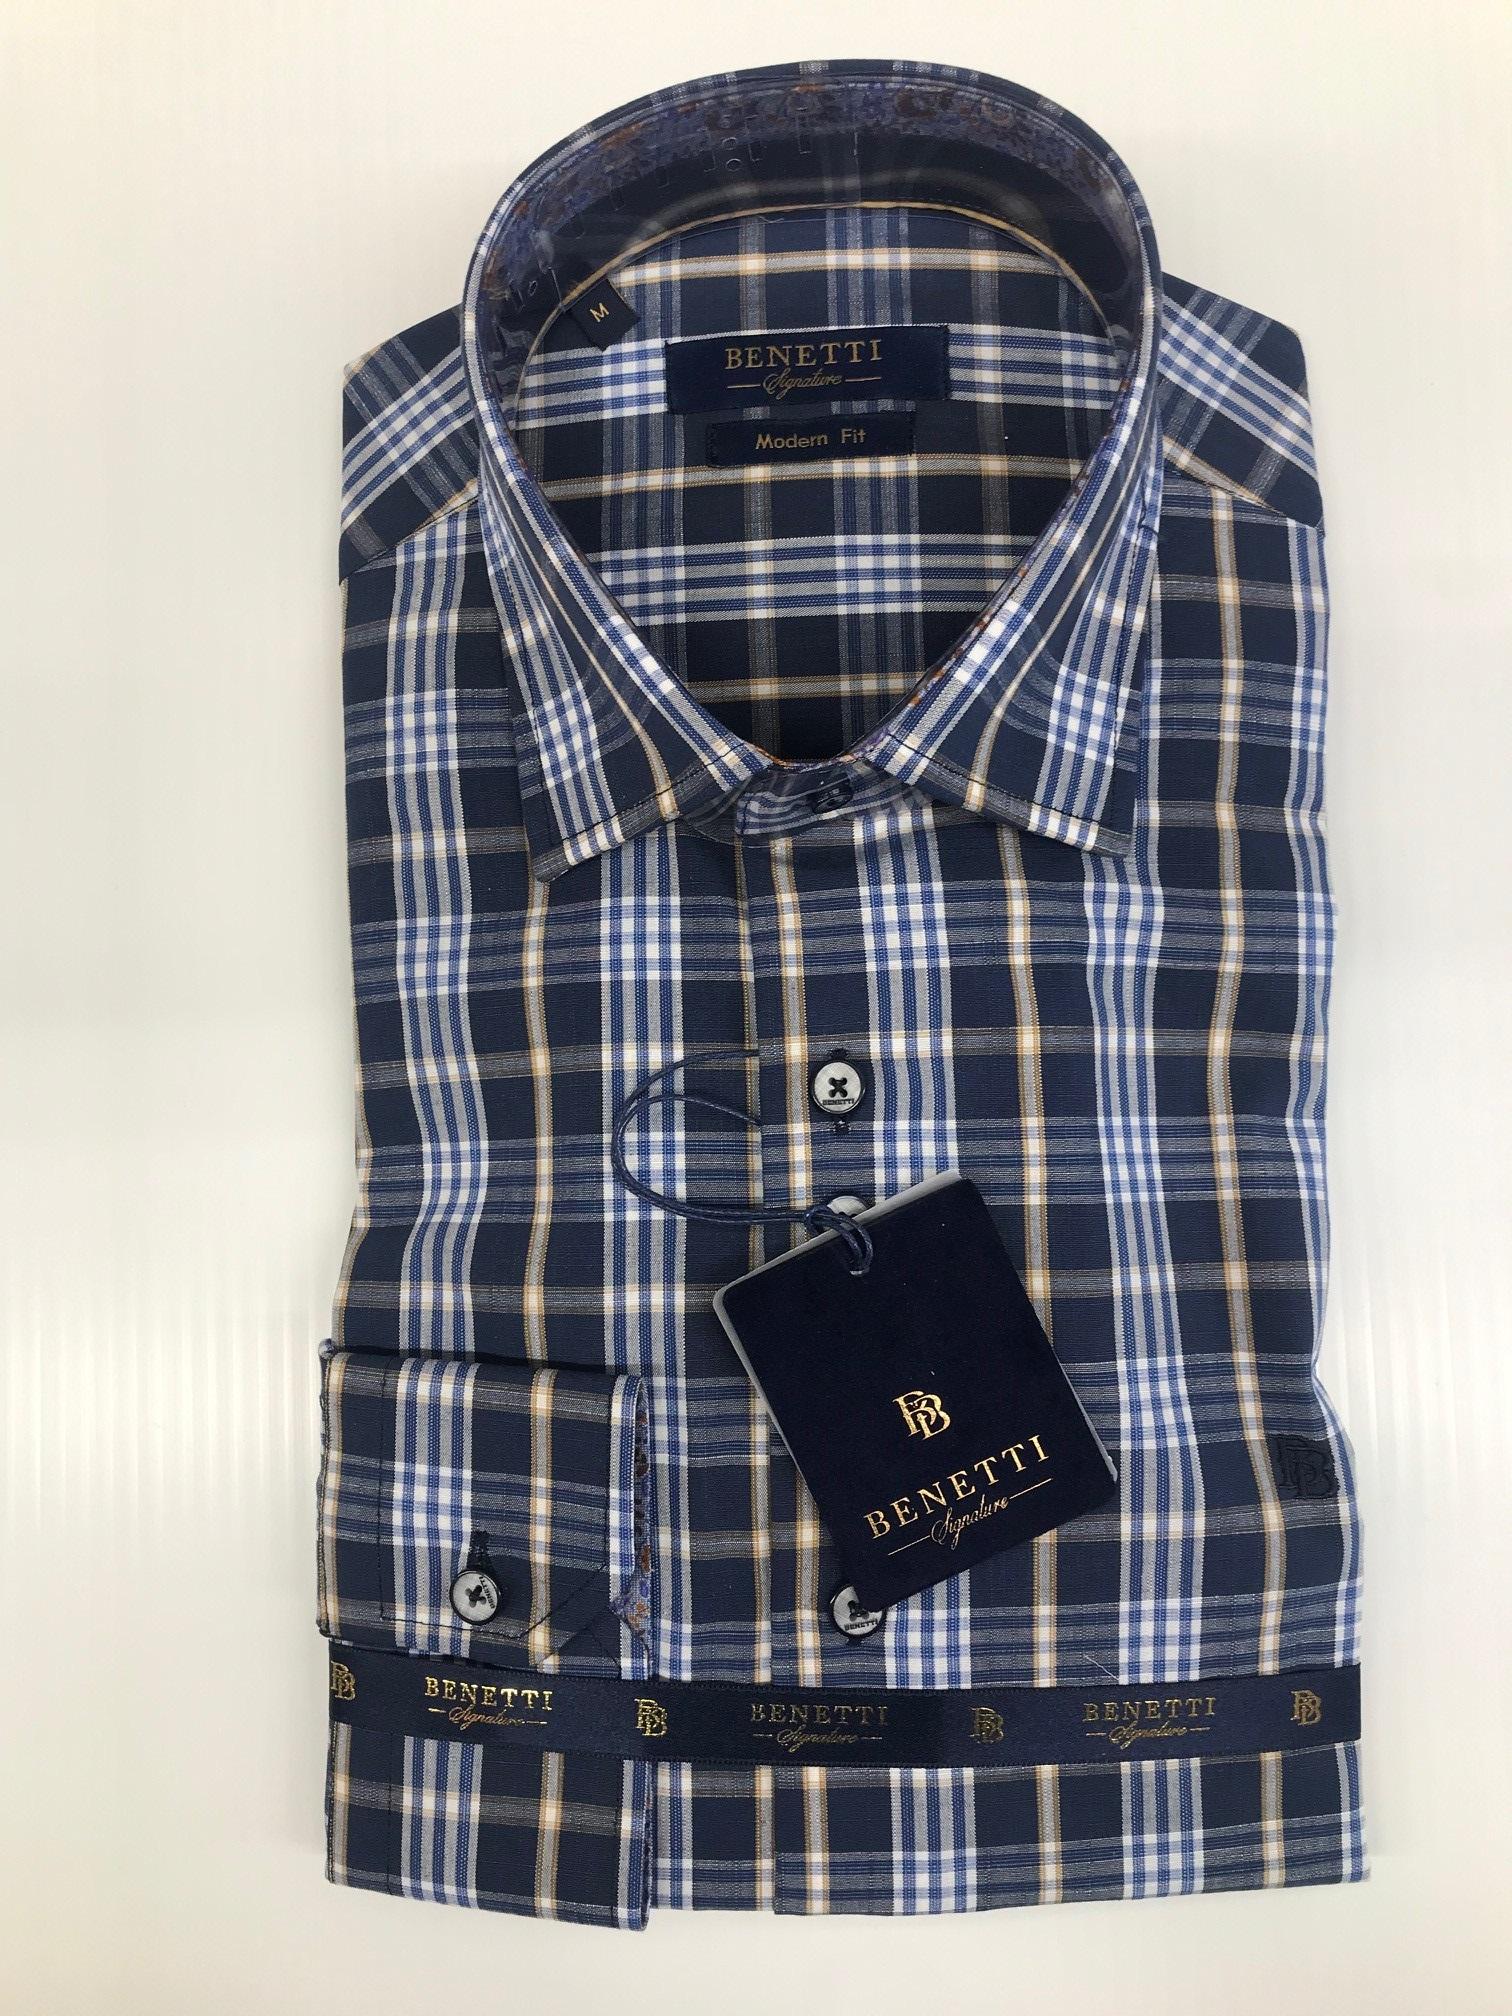 Benetti | Modern Fit Shirt in Blue & Navy